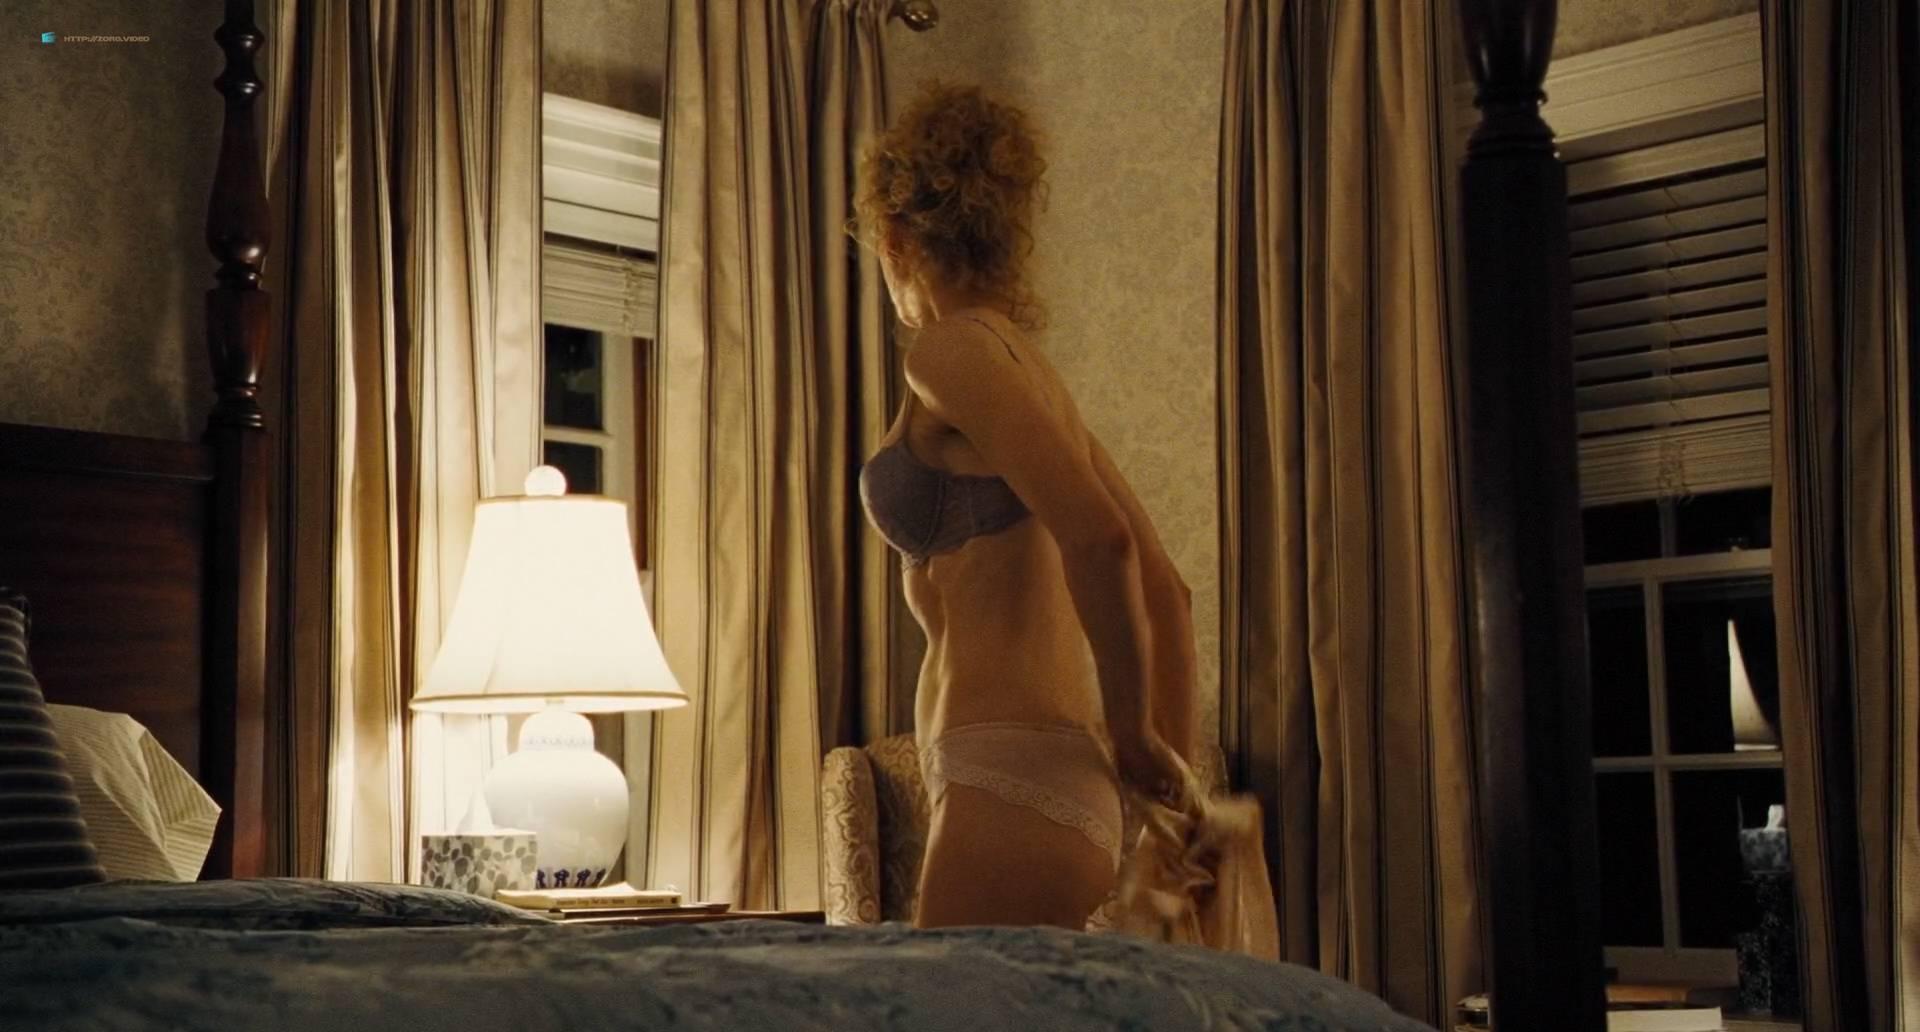 Nicole-Kidman-nude-bush-and-boobs-The-Killing-of-a-Sacred-Deer-2017-HD-1080p-01.jpg